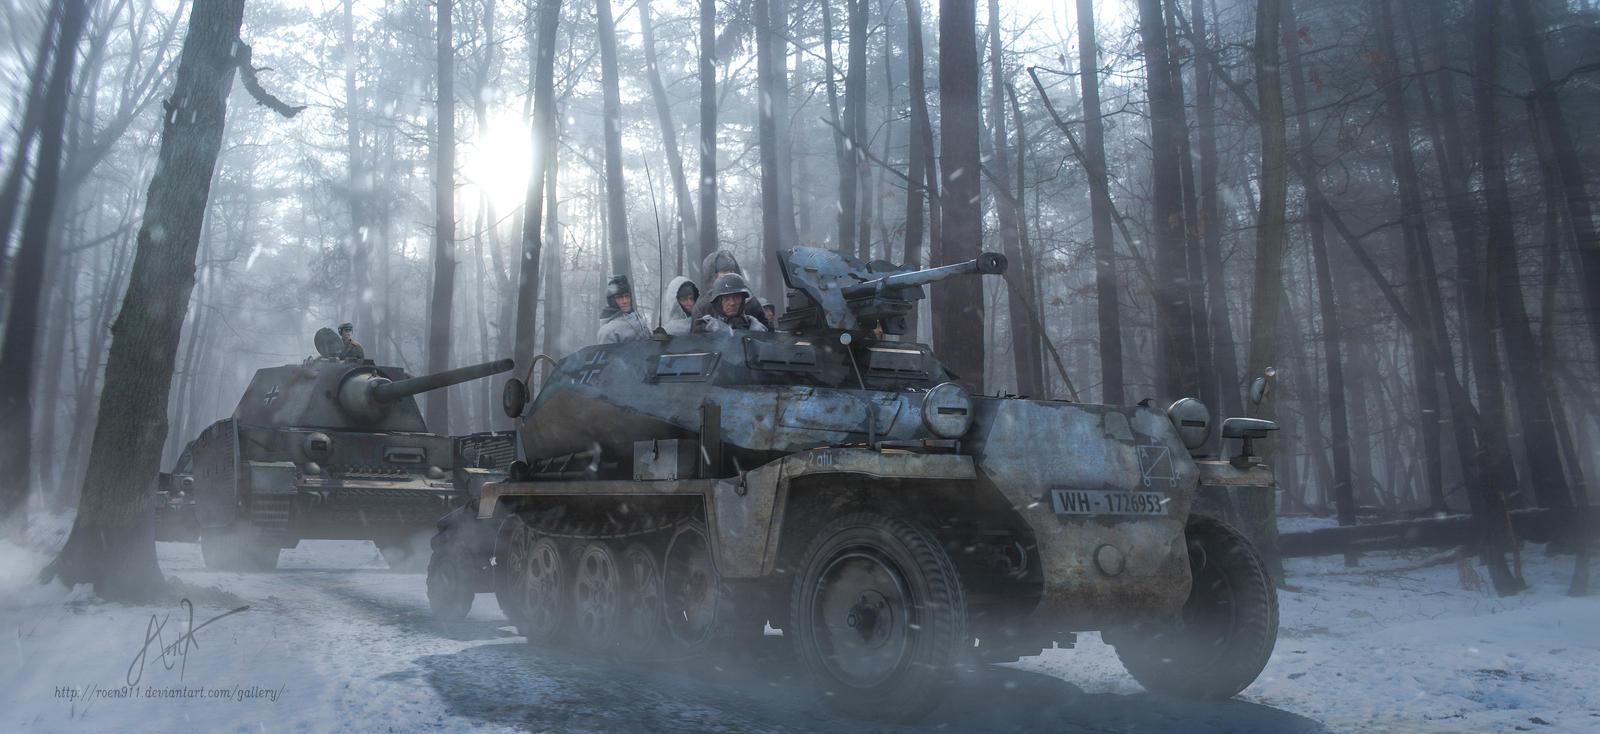 Eastern Front : Frozen Hell